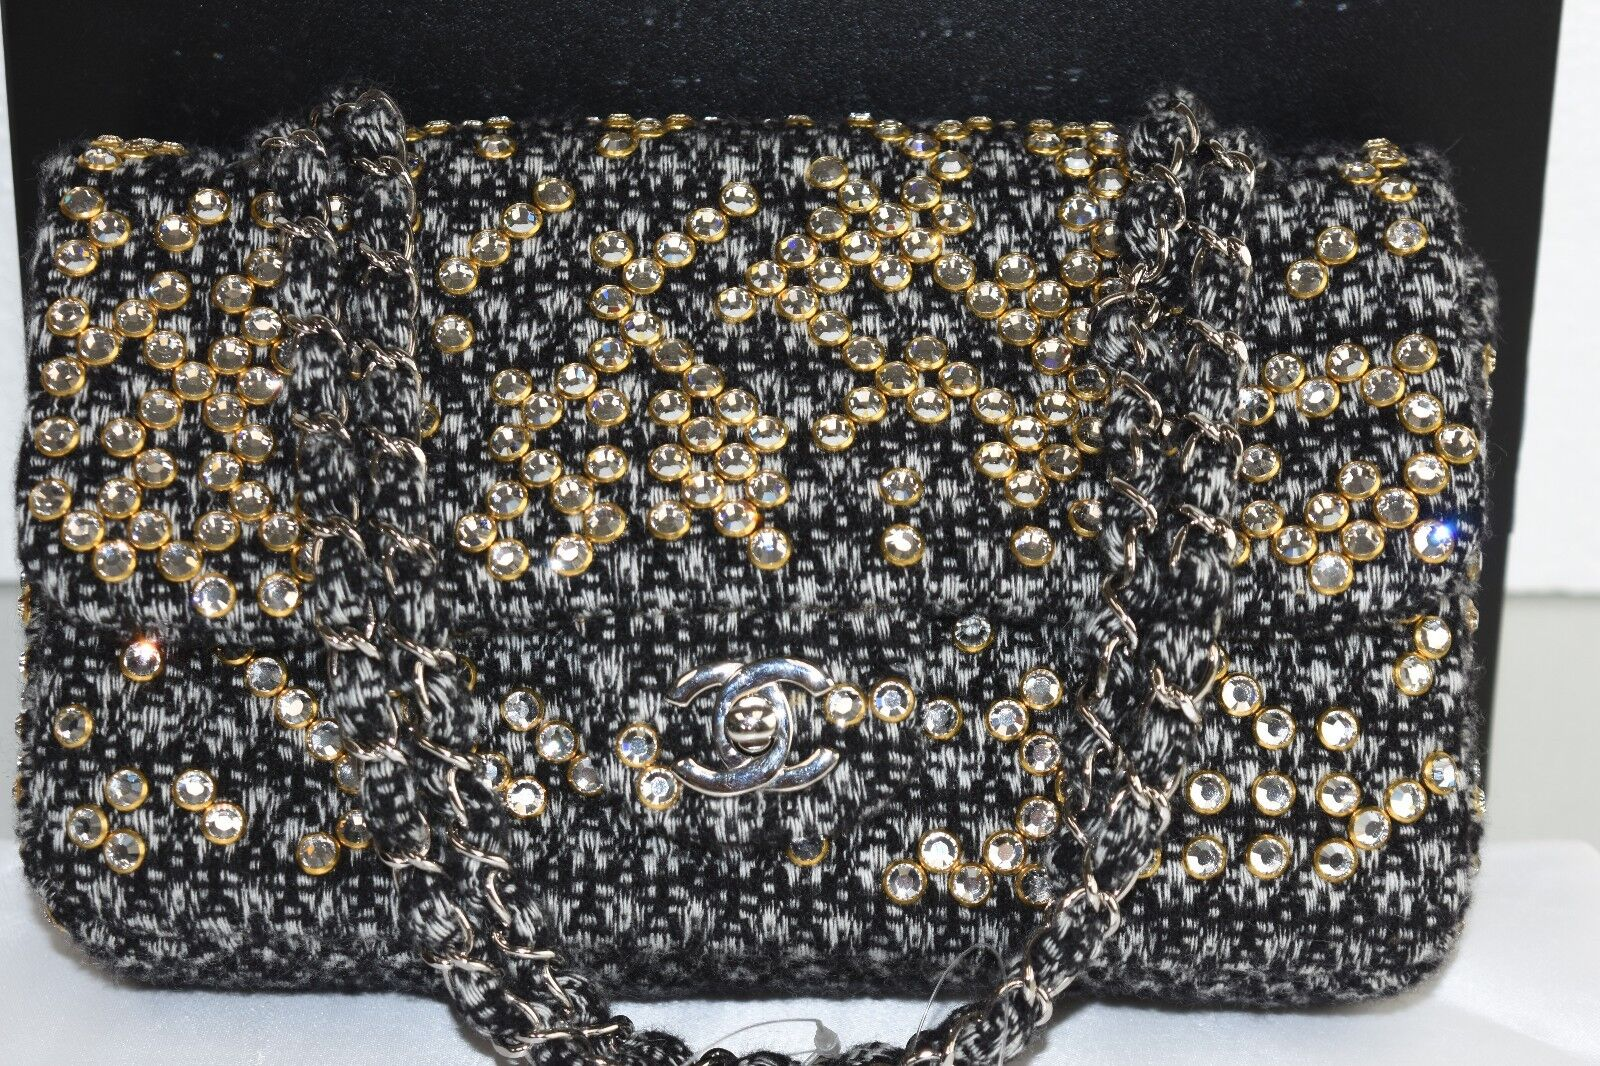 6K NEW CHANEL Classic Bag Flap Tweed Jeweled CRYSTAL STUDS CC Logo White Black